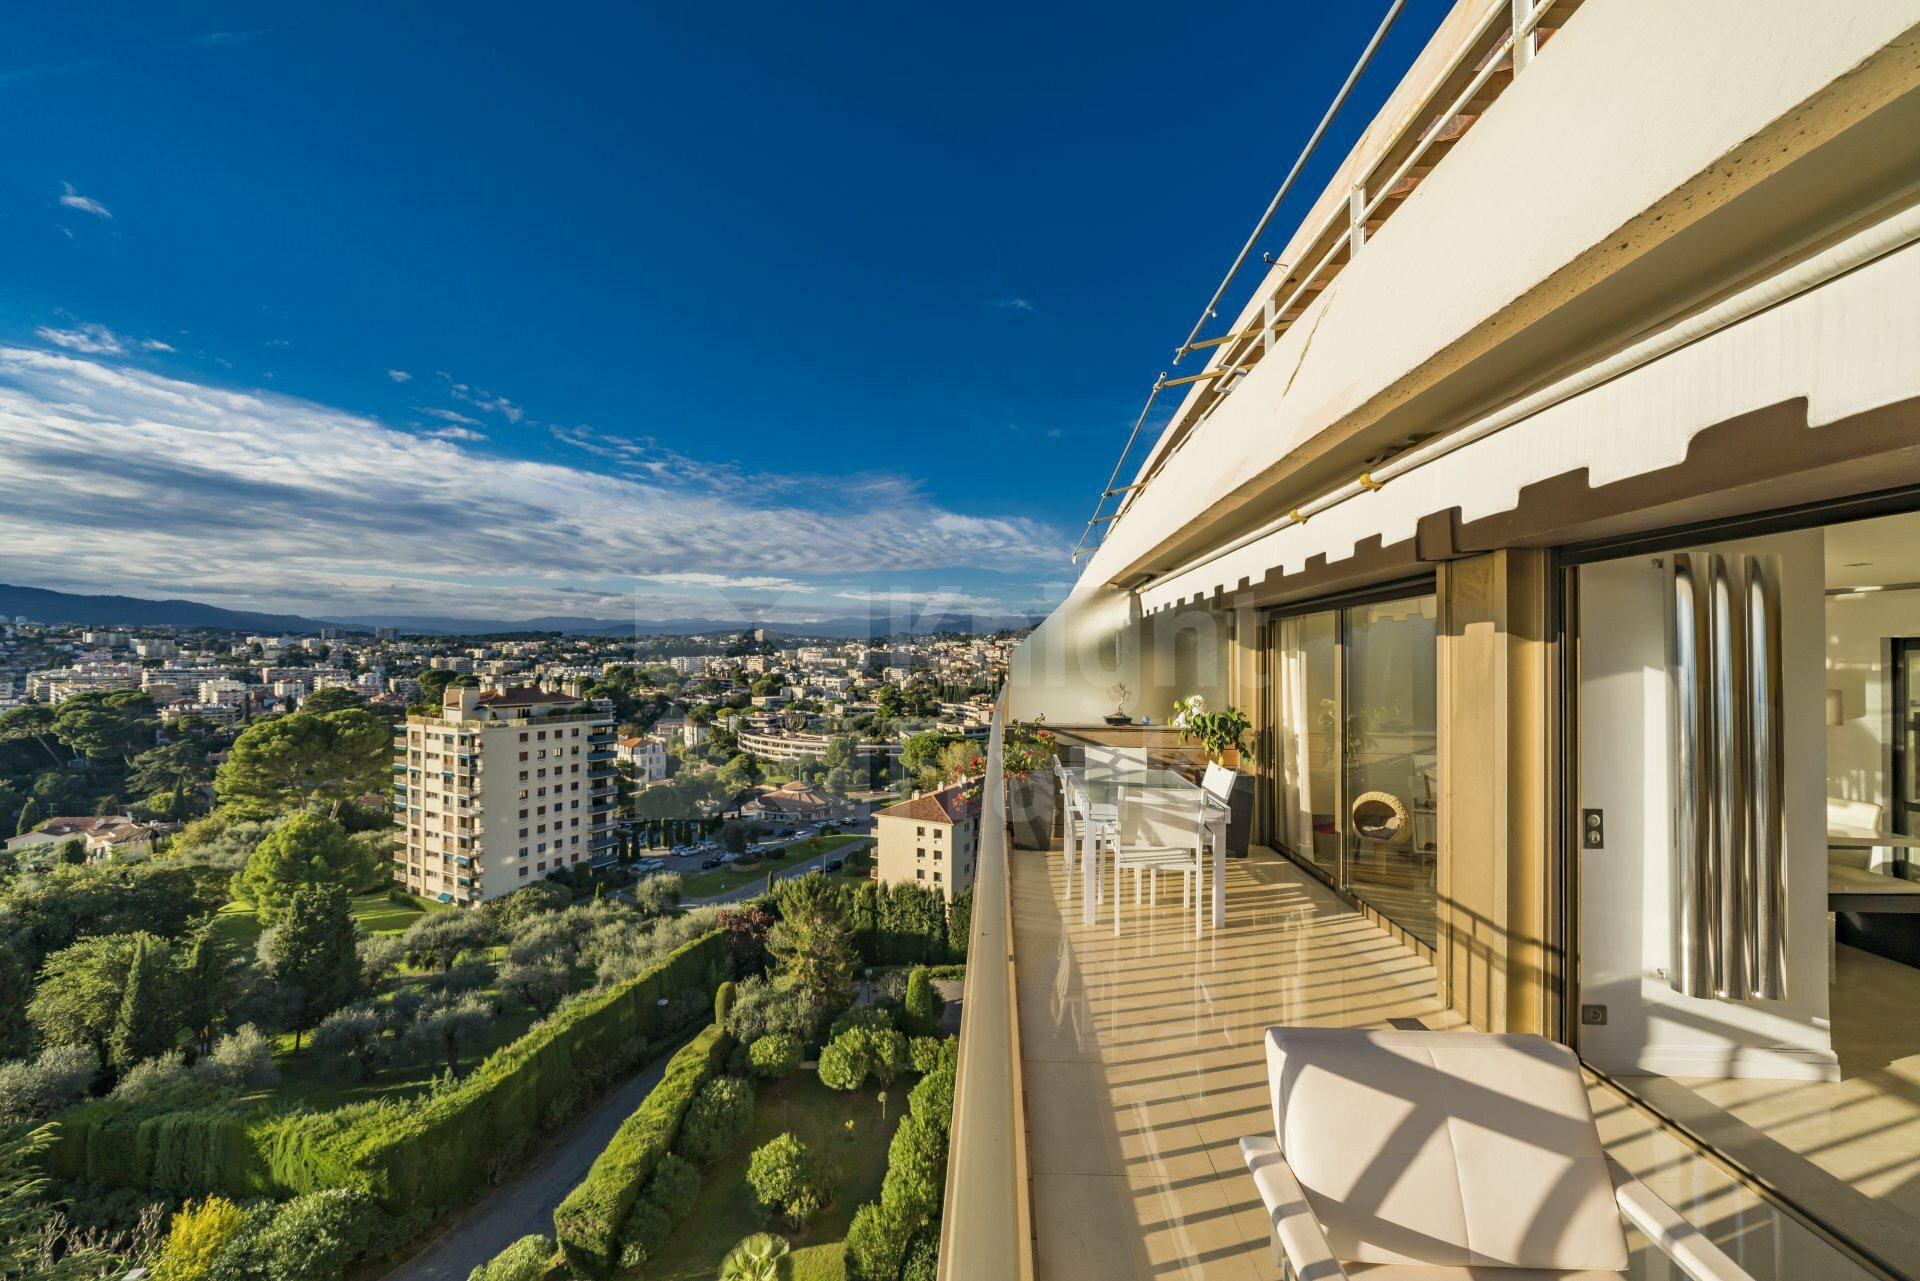 Apartment in Cannes, Provence-Alpes-Côte d'Azur, France 1 - 11487482